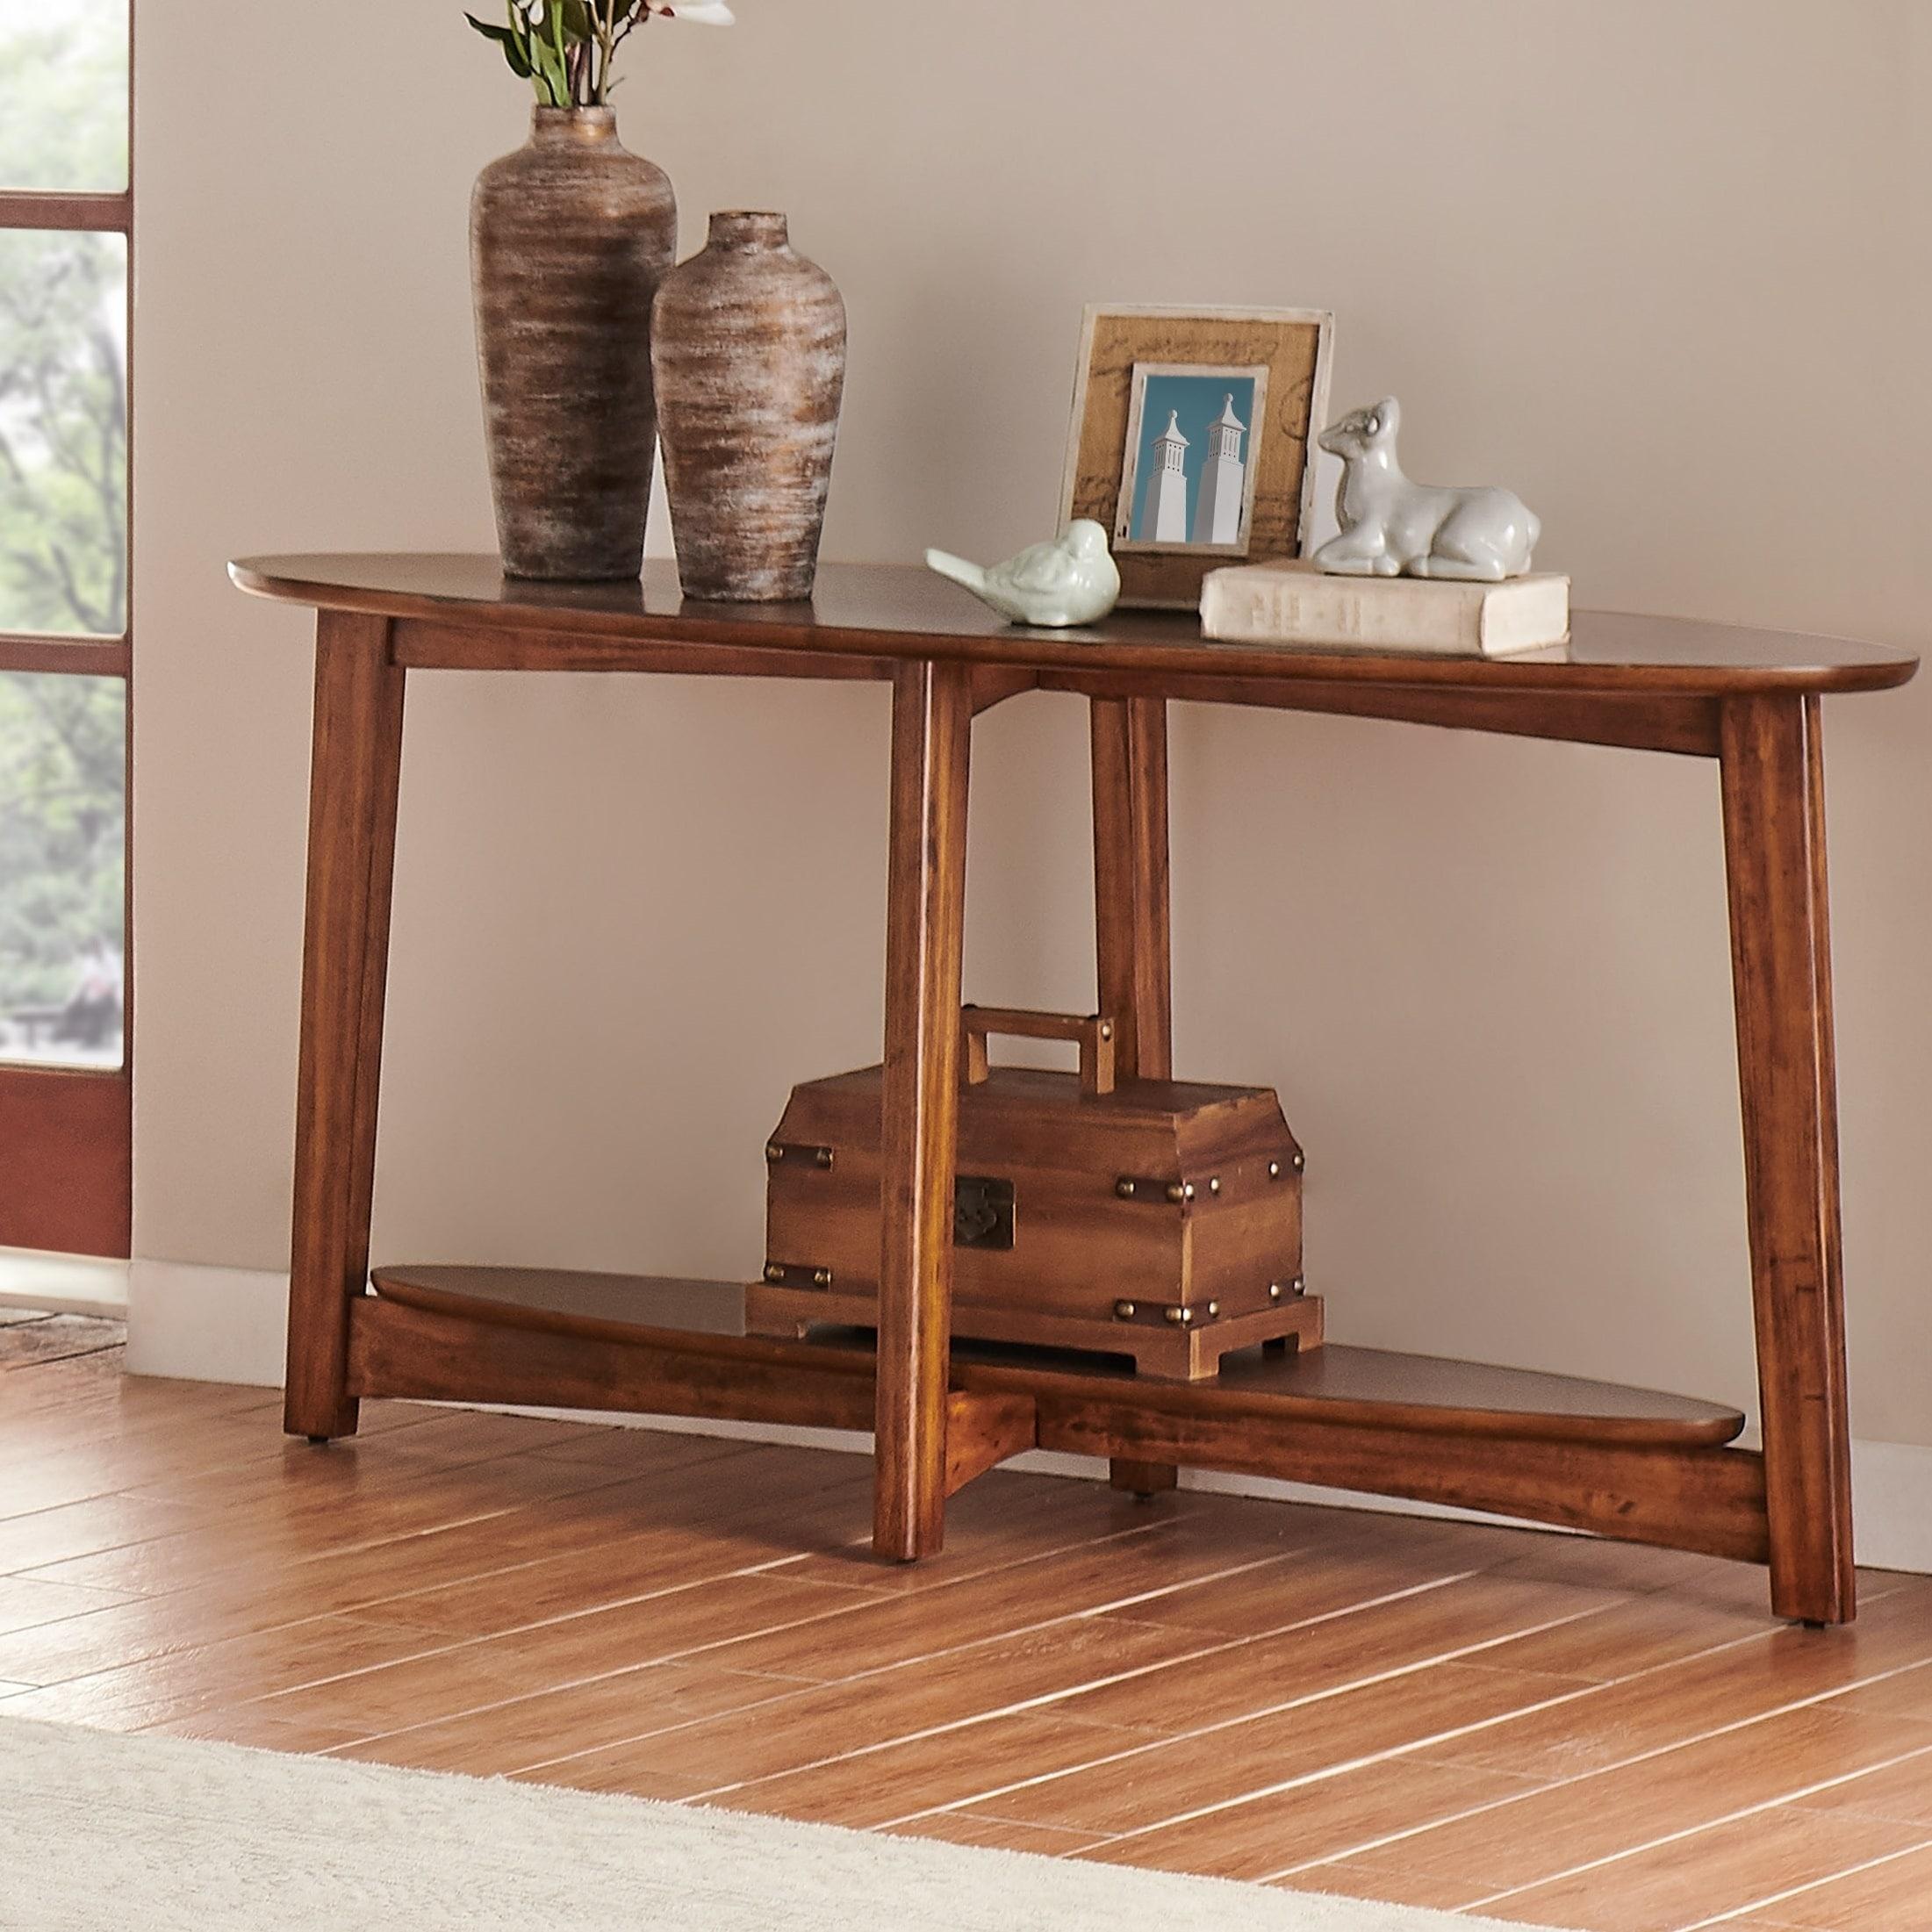 Carson Carrington Yttertanger Mid Century Modern Console Entryway Table Overstock 29871452